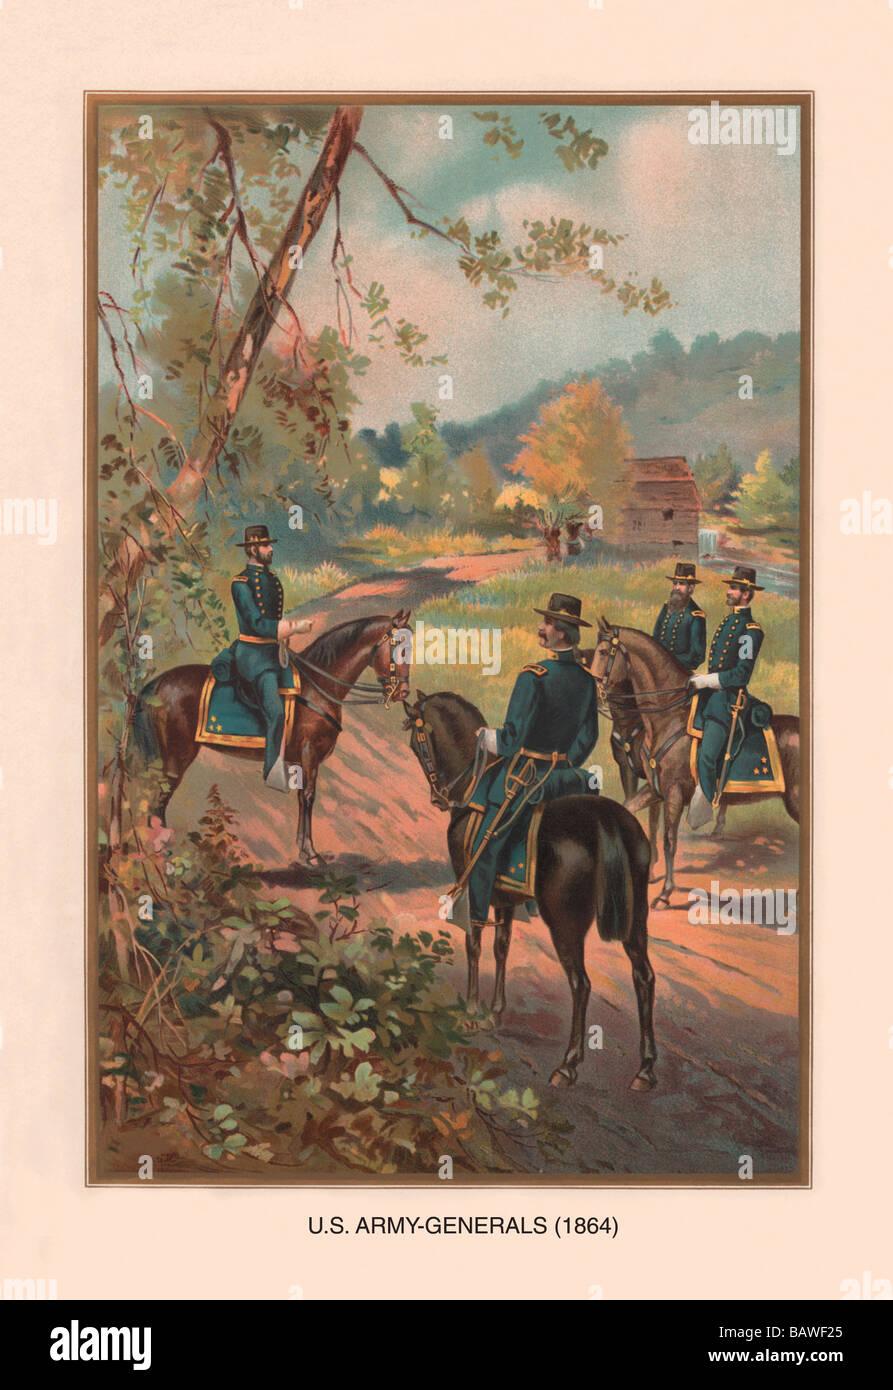 U.S. Army Generals,1864 - Stock Image